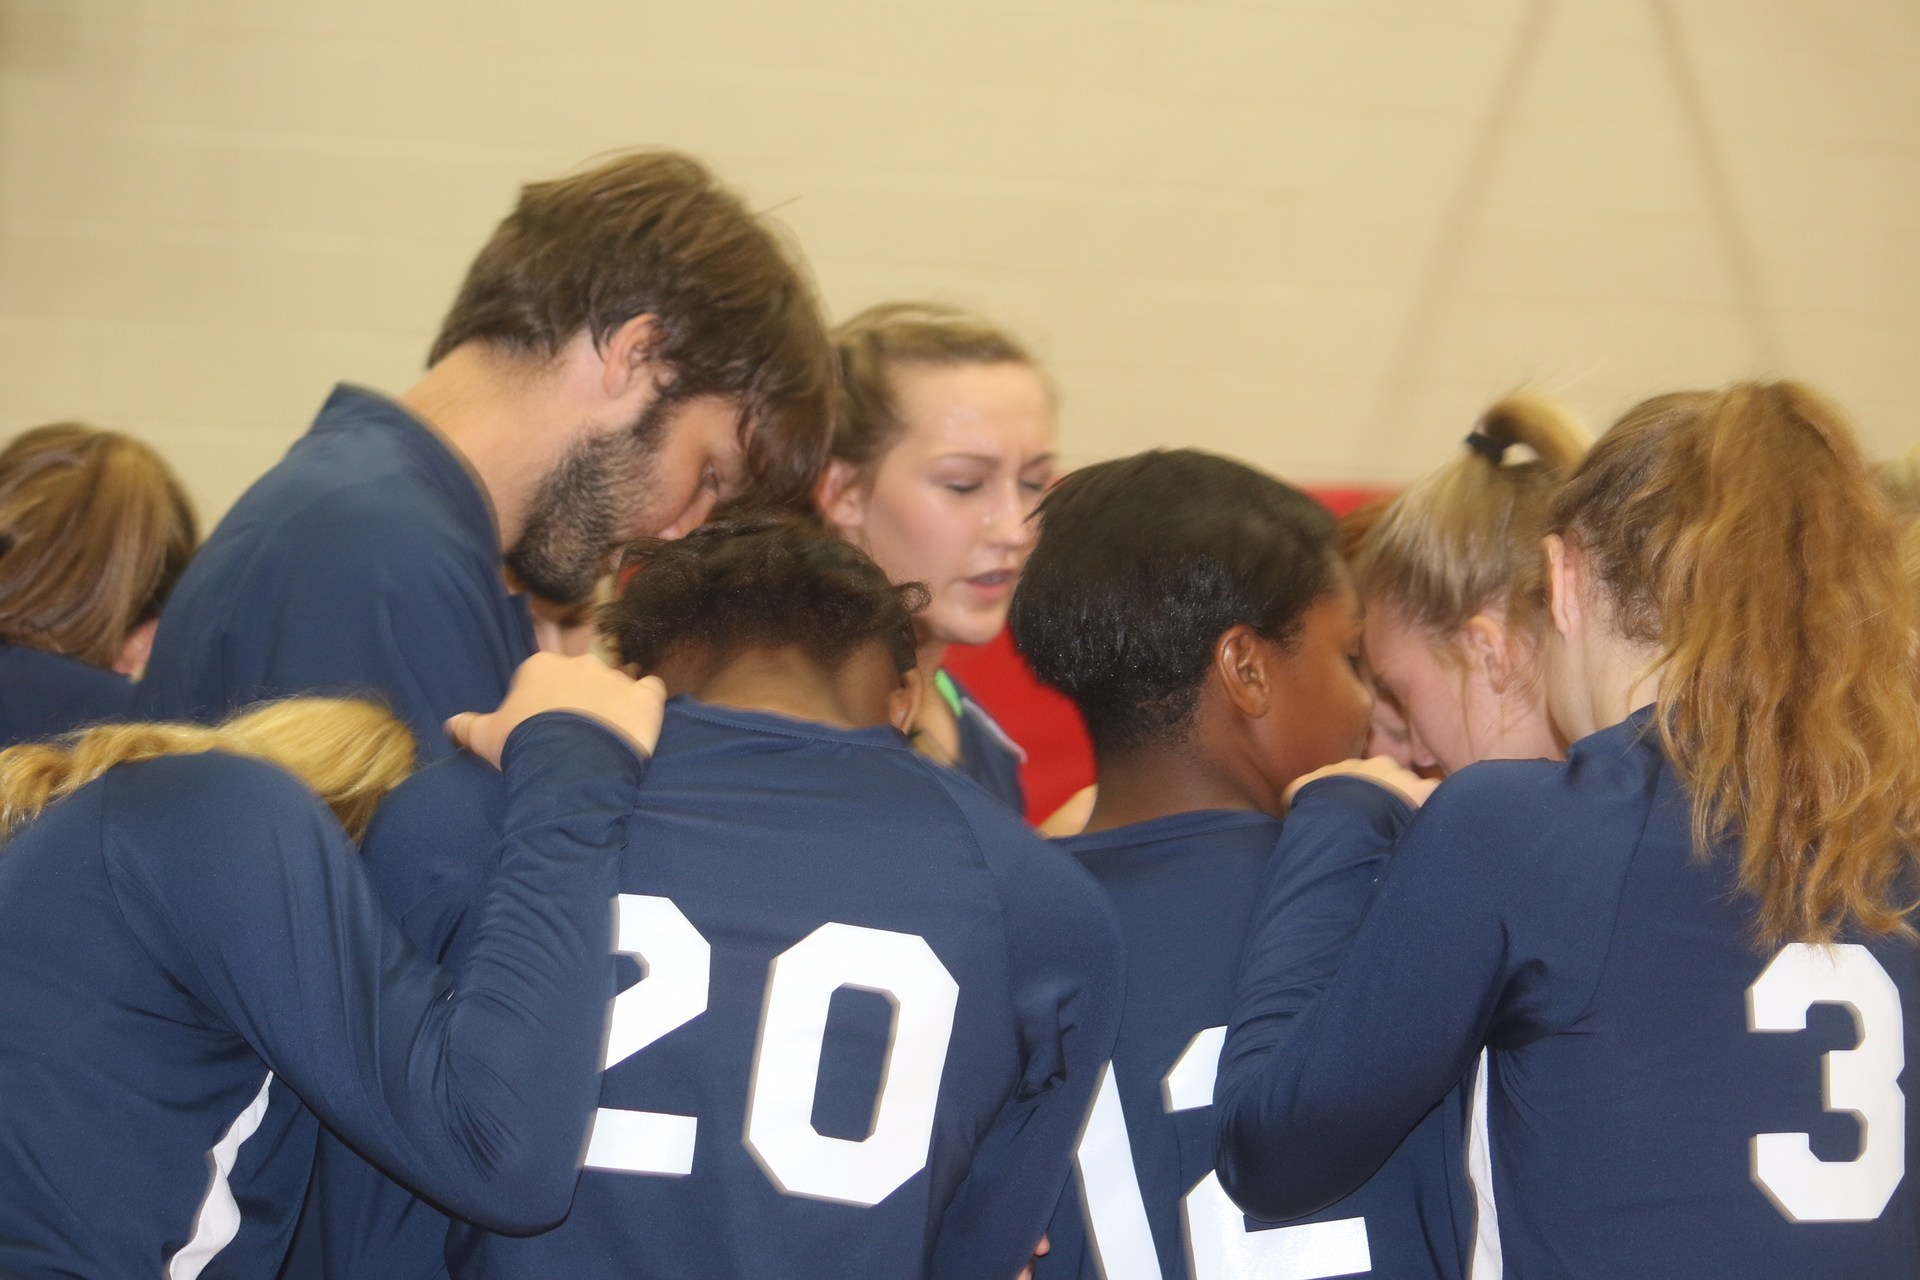 team praying together in huddle